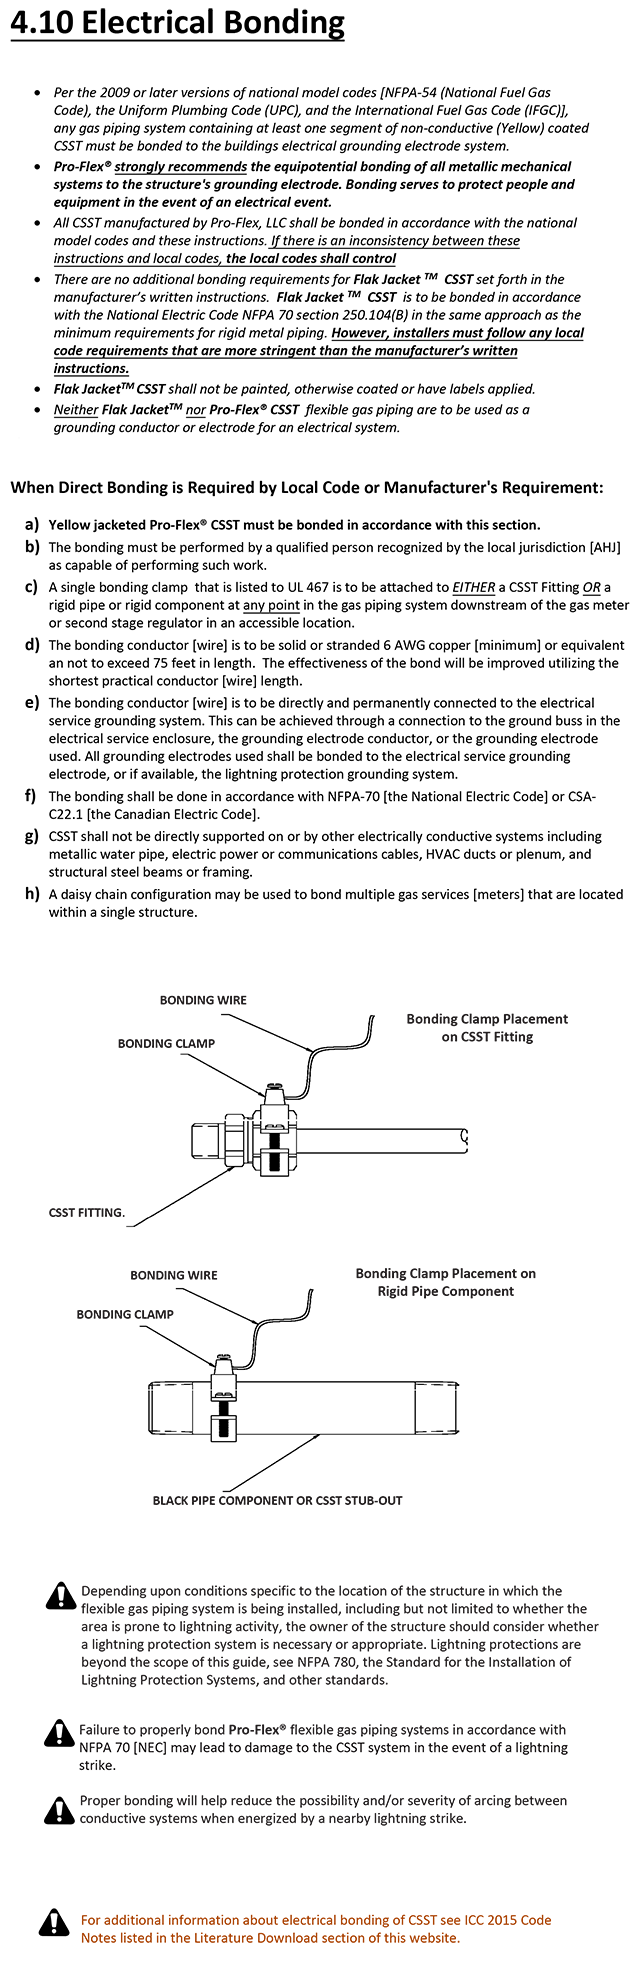 Electrical Bonding Proflex Csst Icc Wiring Diagram